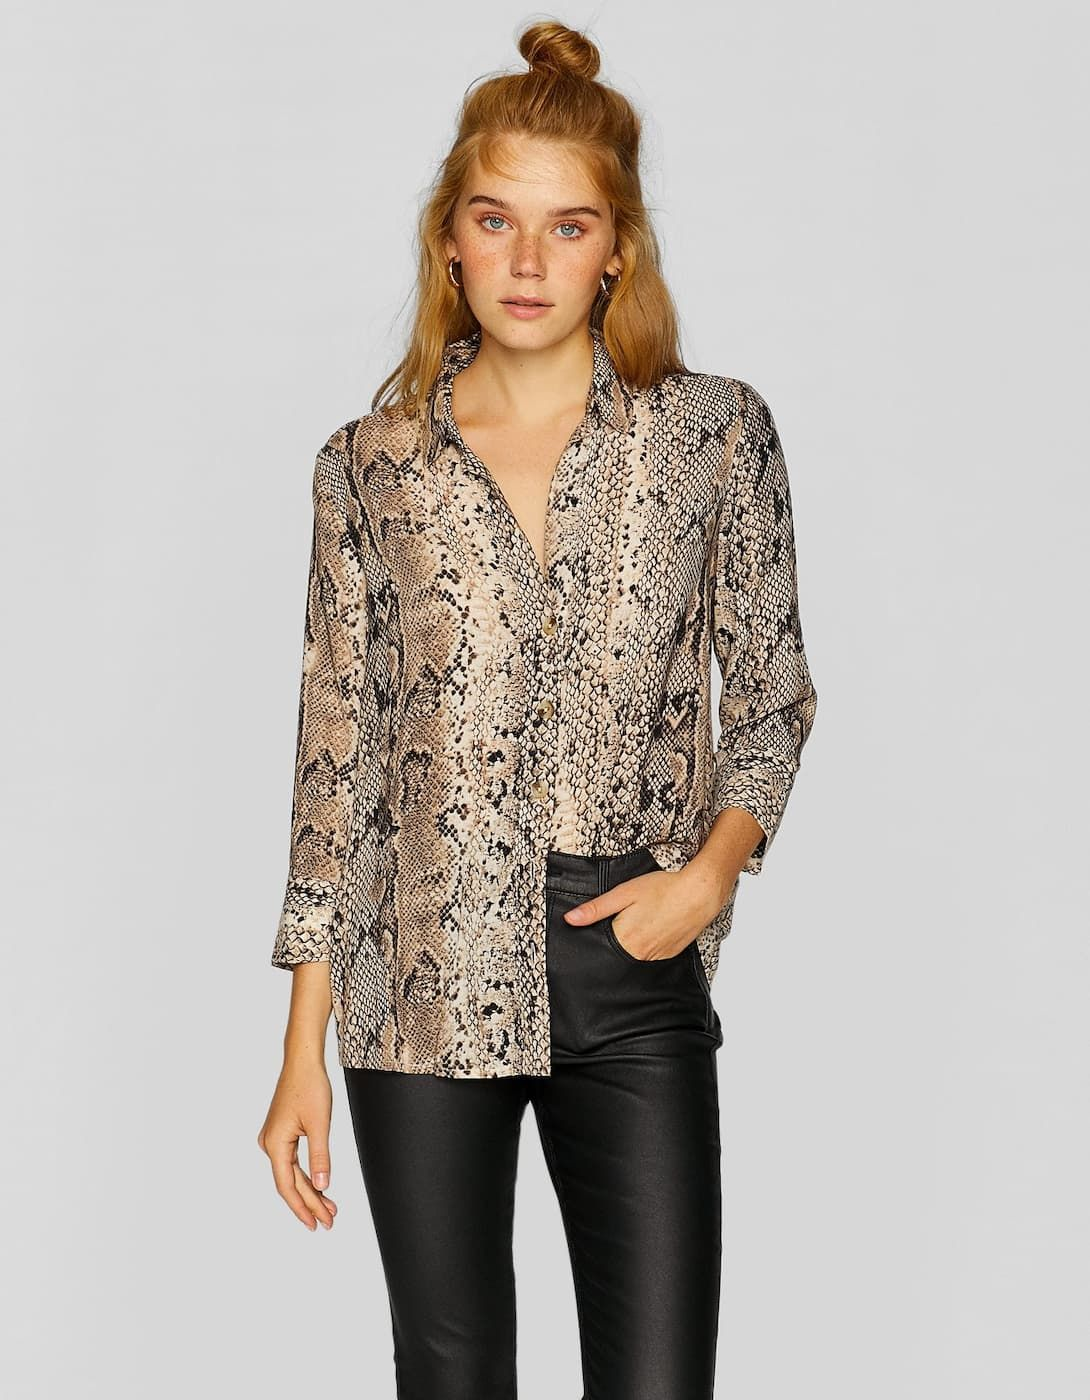 d9847d353fa12 Viscose snakeskin print shirt - Shirts   Blouses